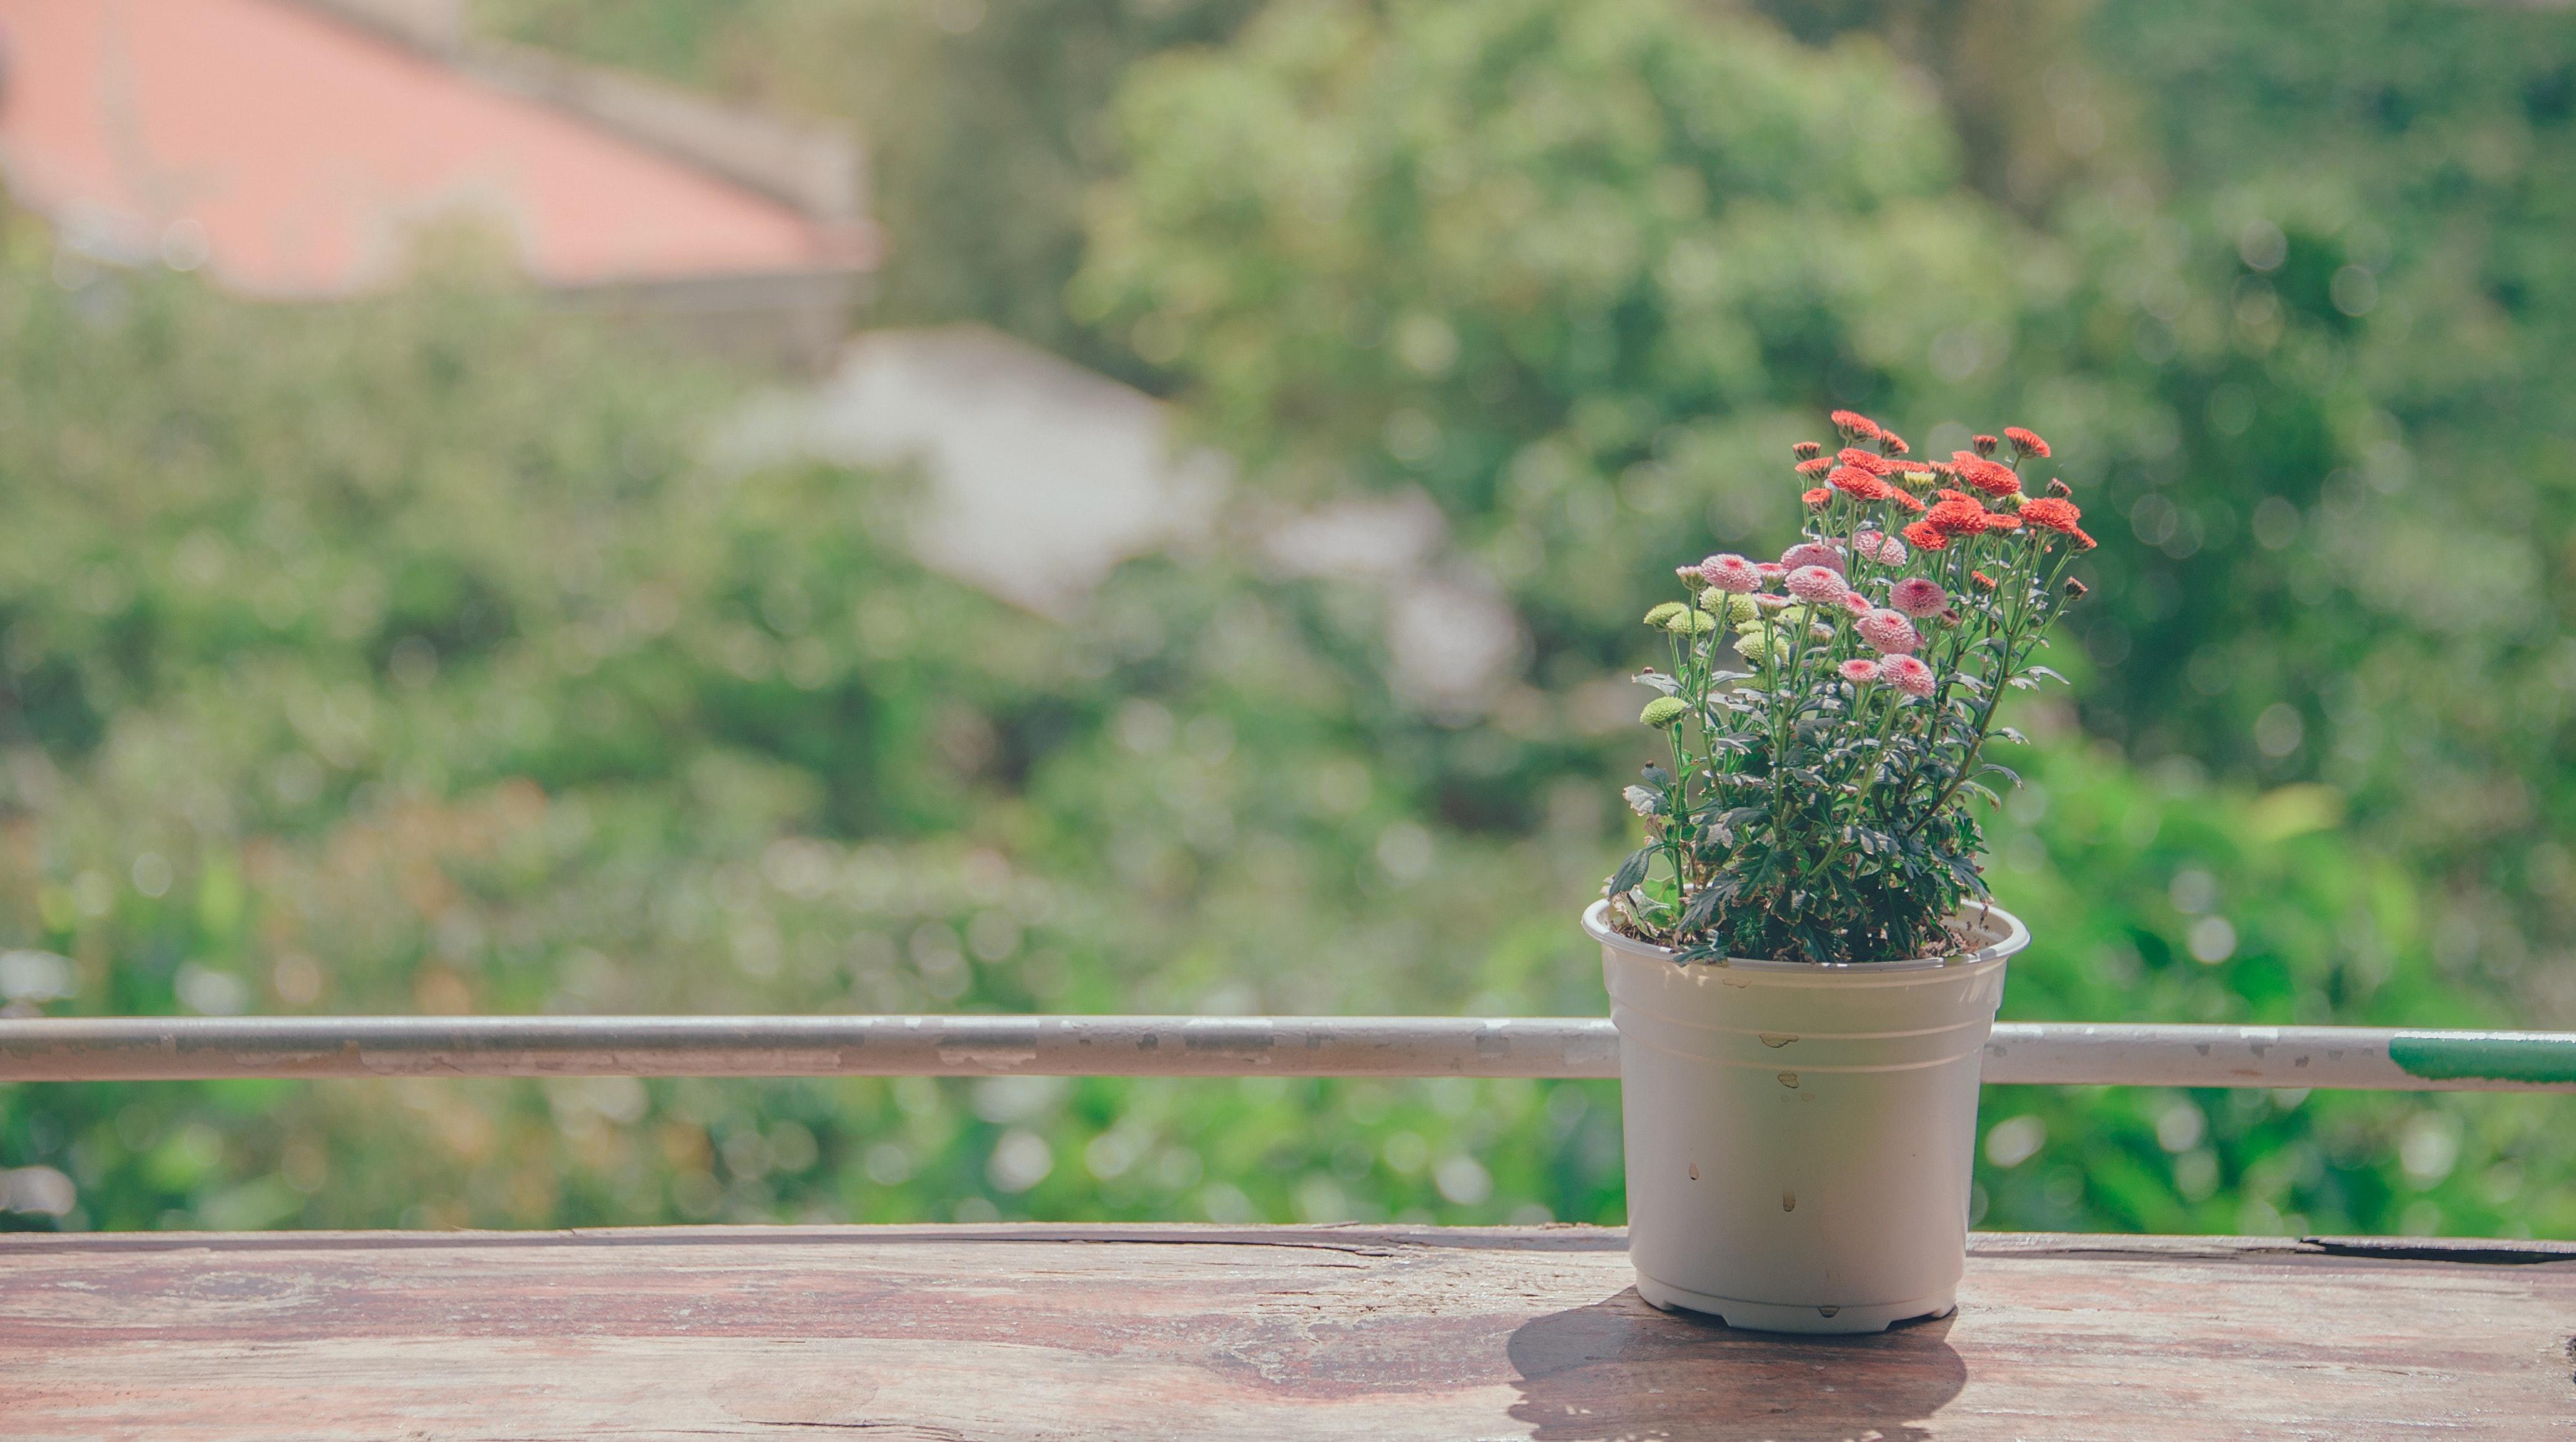 Pot of flowers near balcony photo